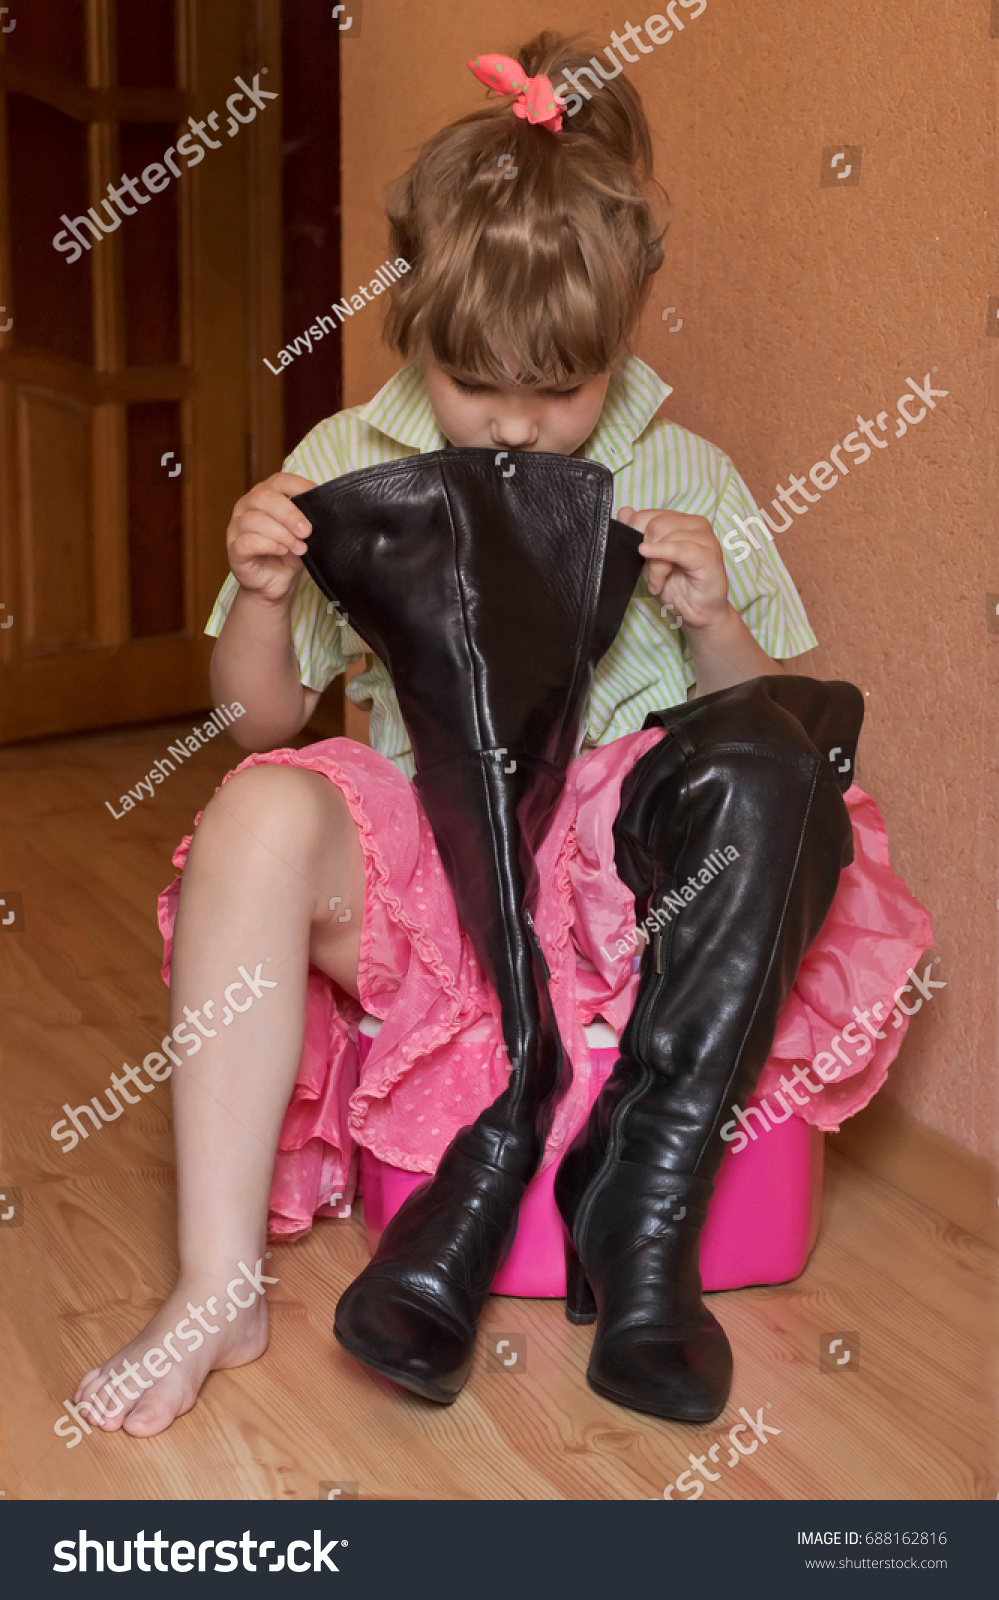 High Black Boots Hessian Boots Little